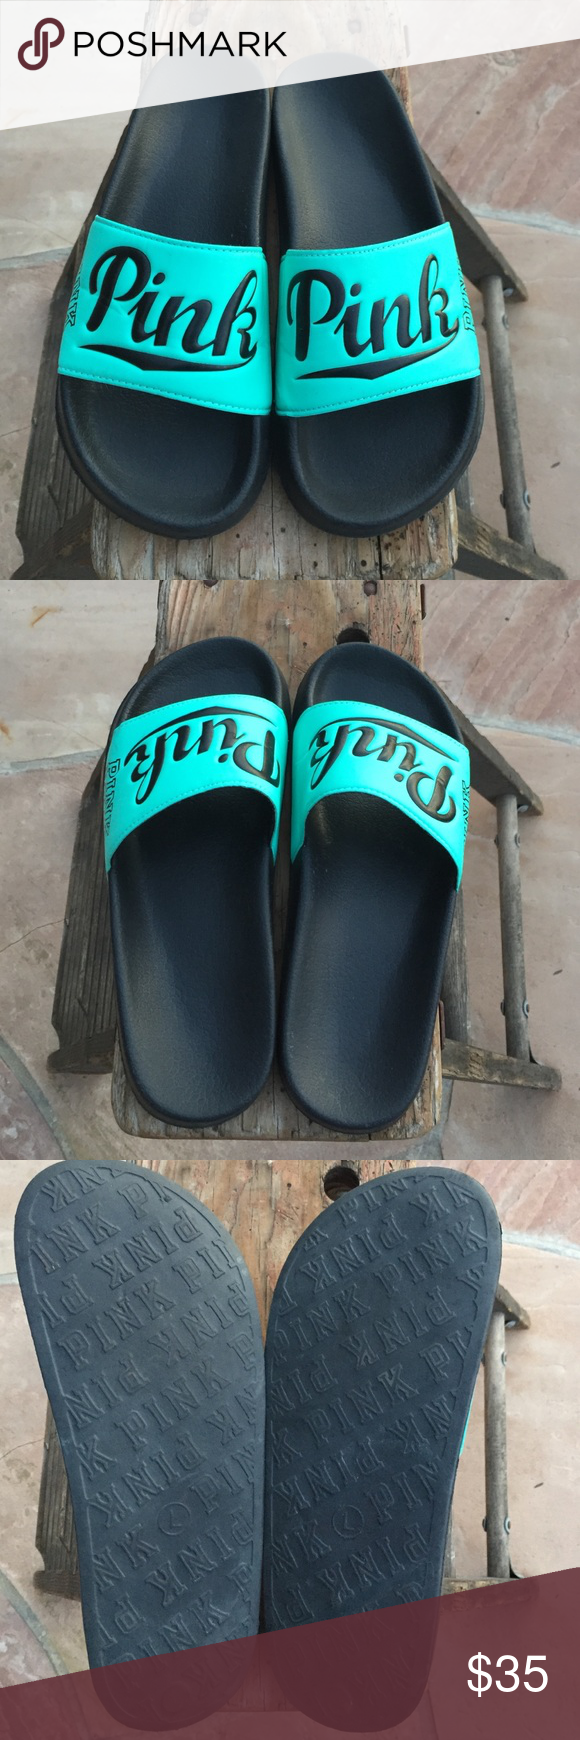 844776bb152 PINK VICTORIA SECRET Large 9-10 Slides Size large 9-10. Worn a few times  excellent condition. Teal with black PINK Victoria s Secret Shoes Sandals